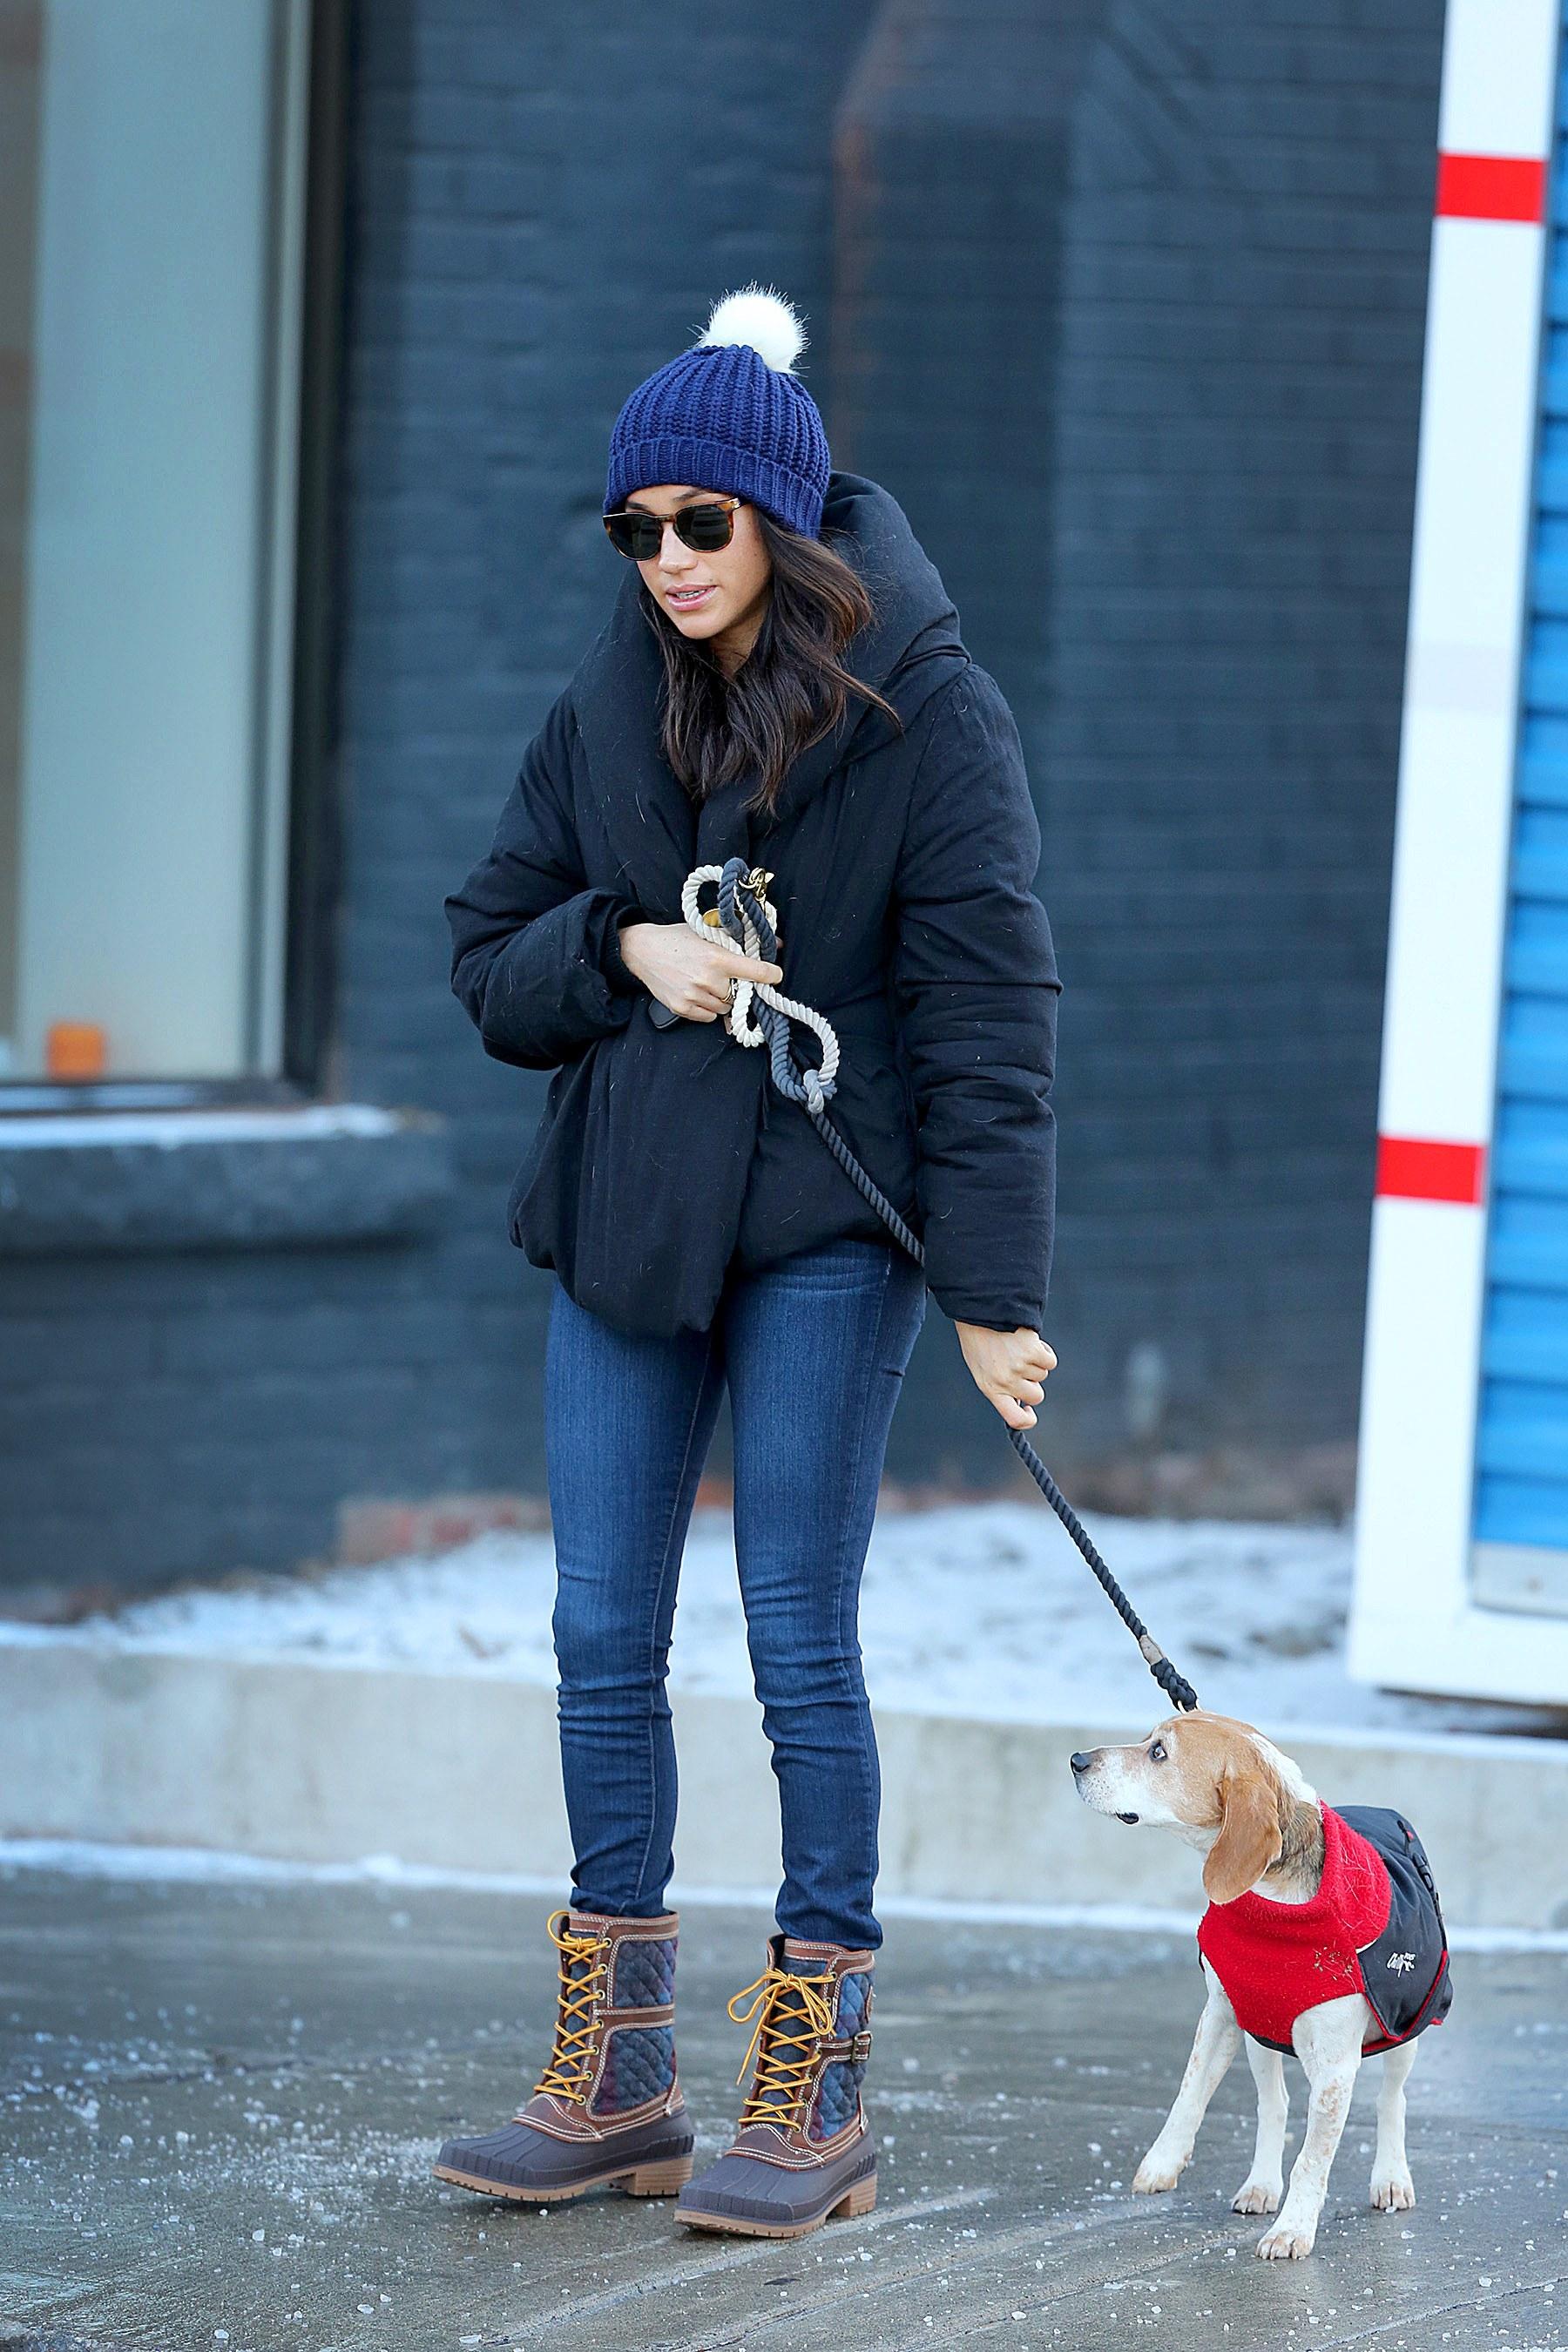 Best Dog Walking Boots